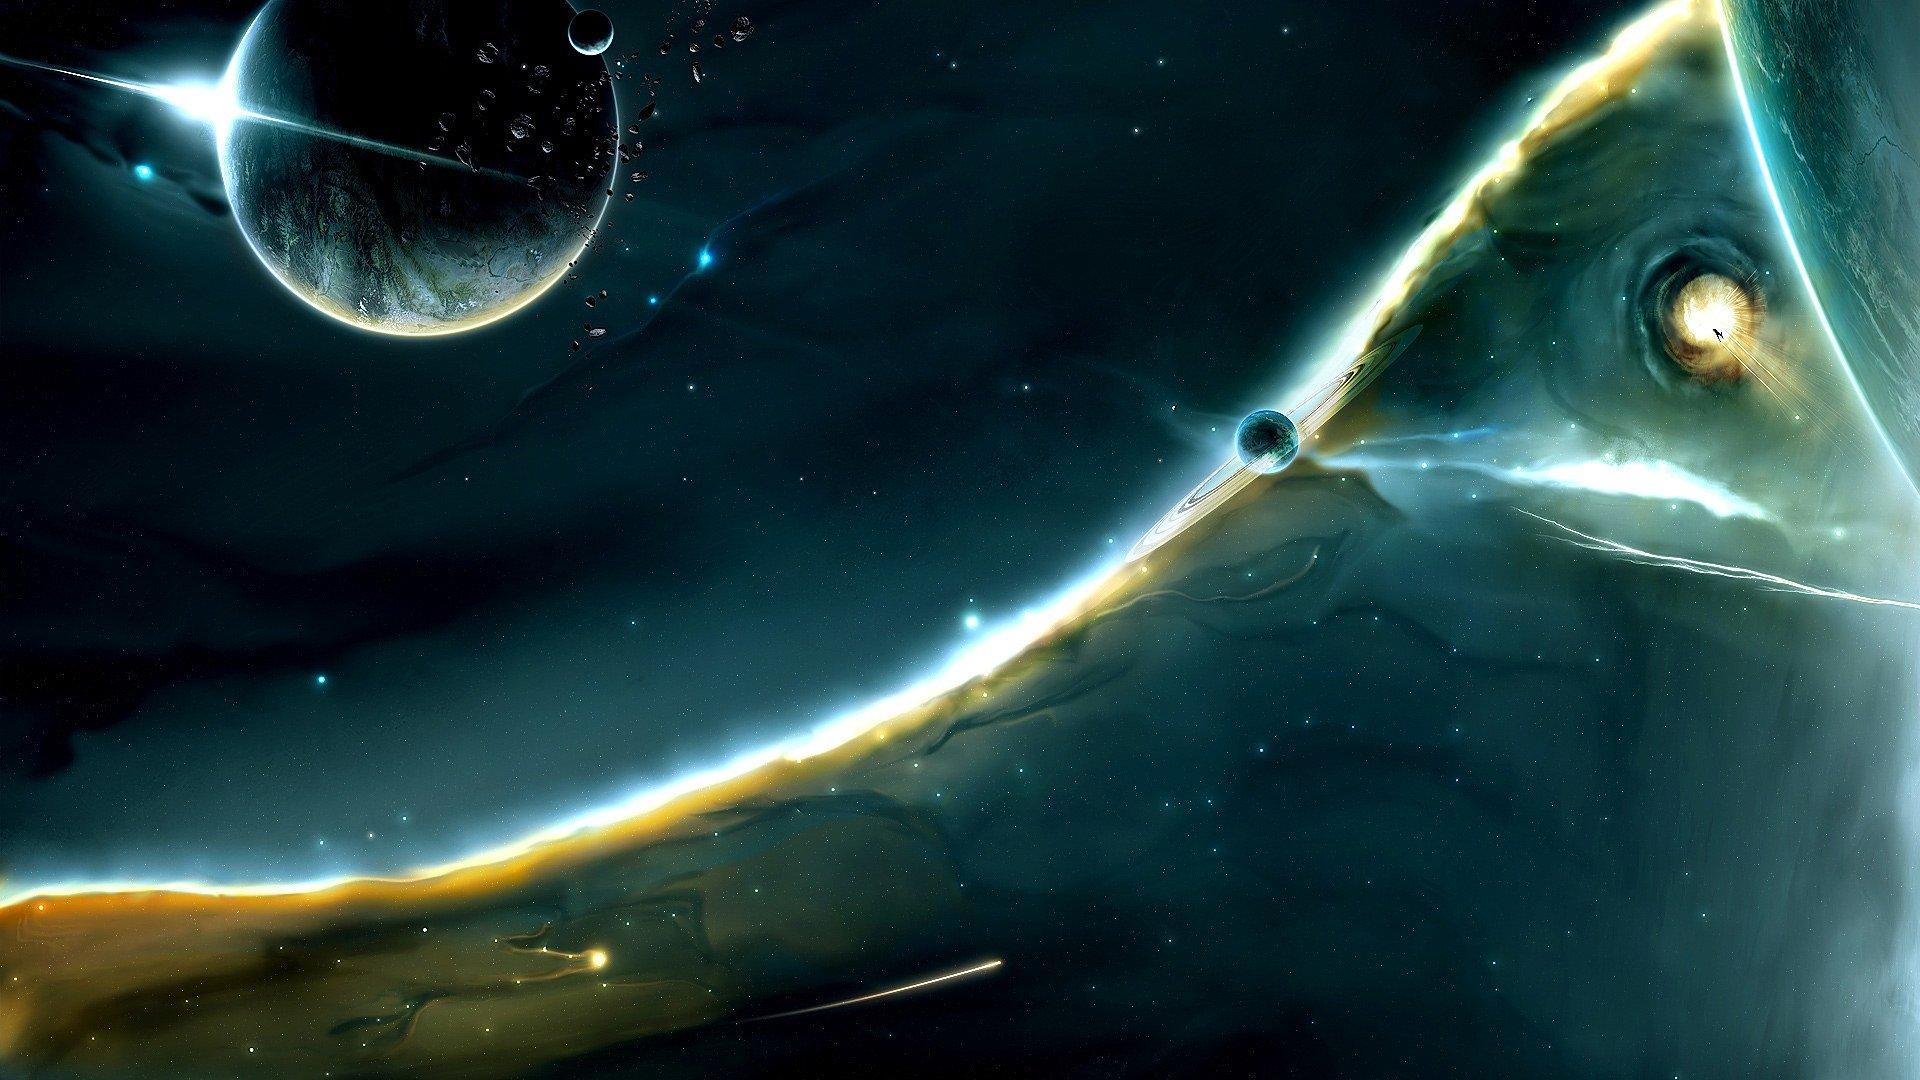 L'horloger de notre dame_page:2_ space-wallpaper-full-hd-stars-planet